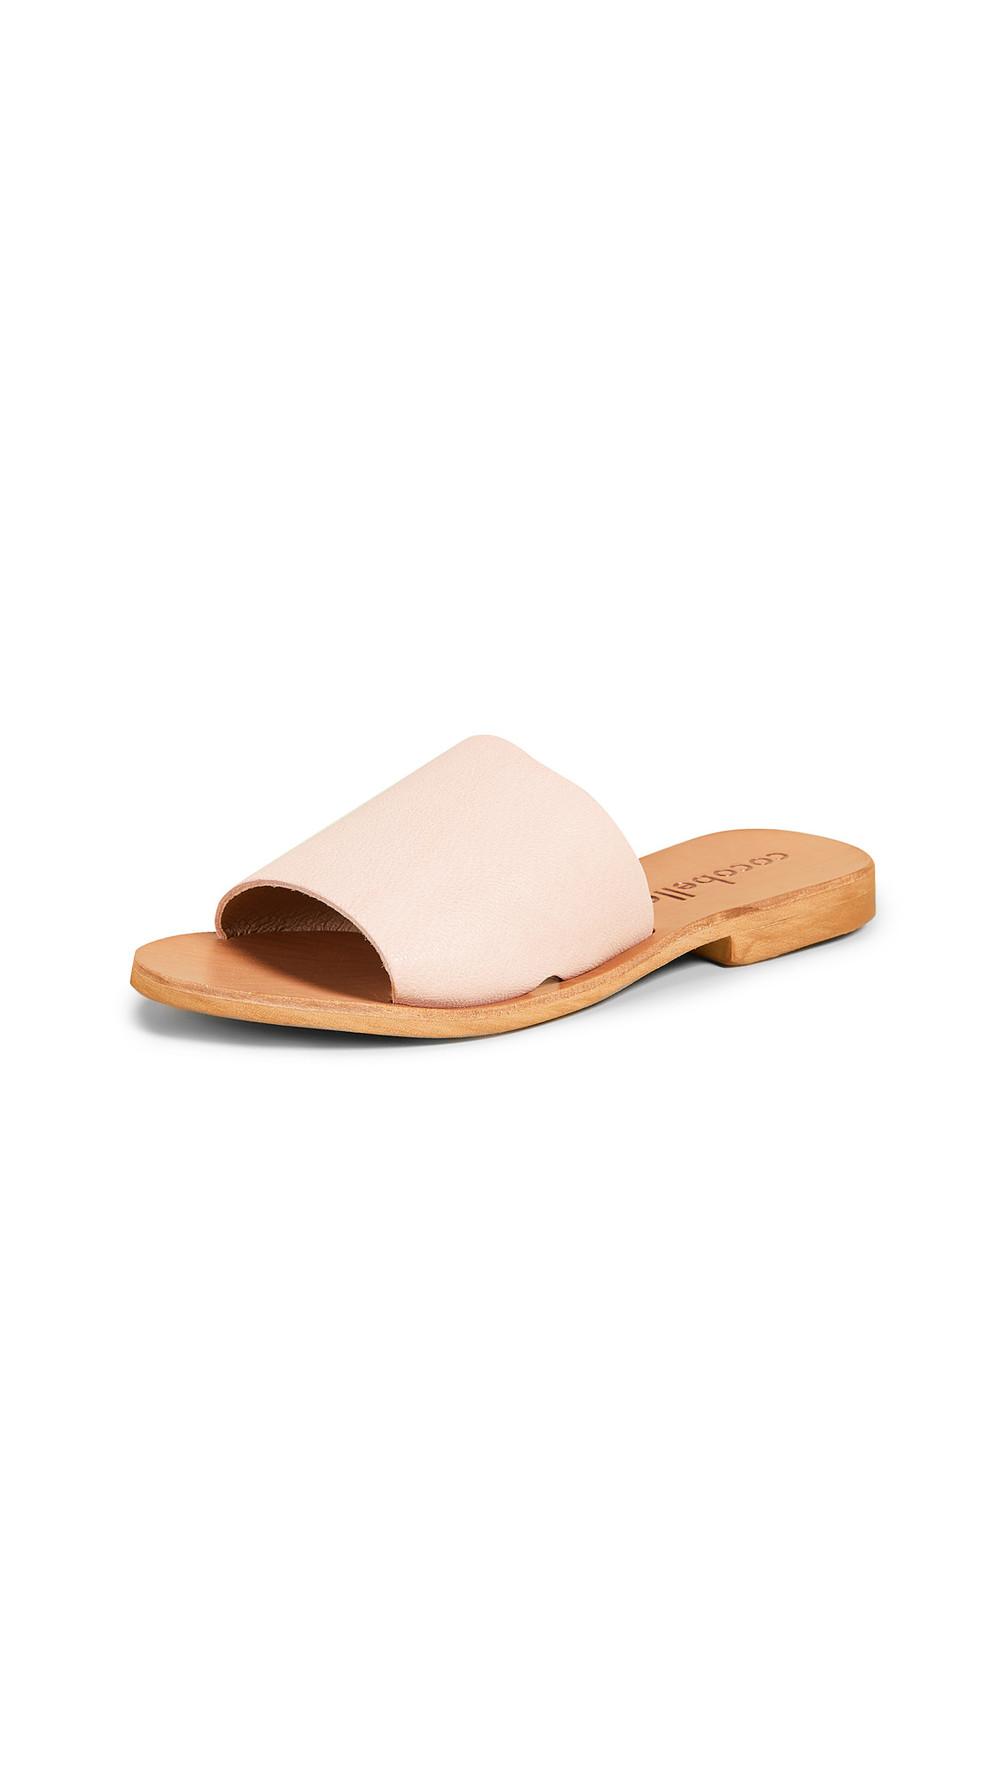 Cocobelle Bhea Slides in rose